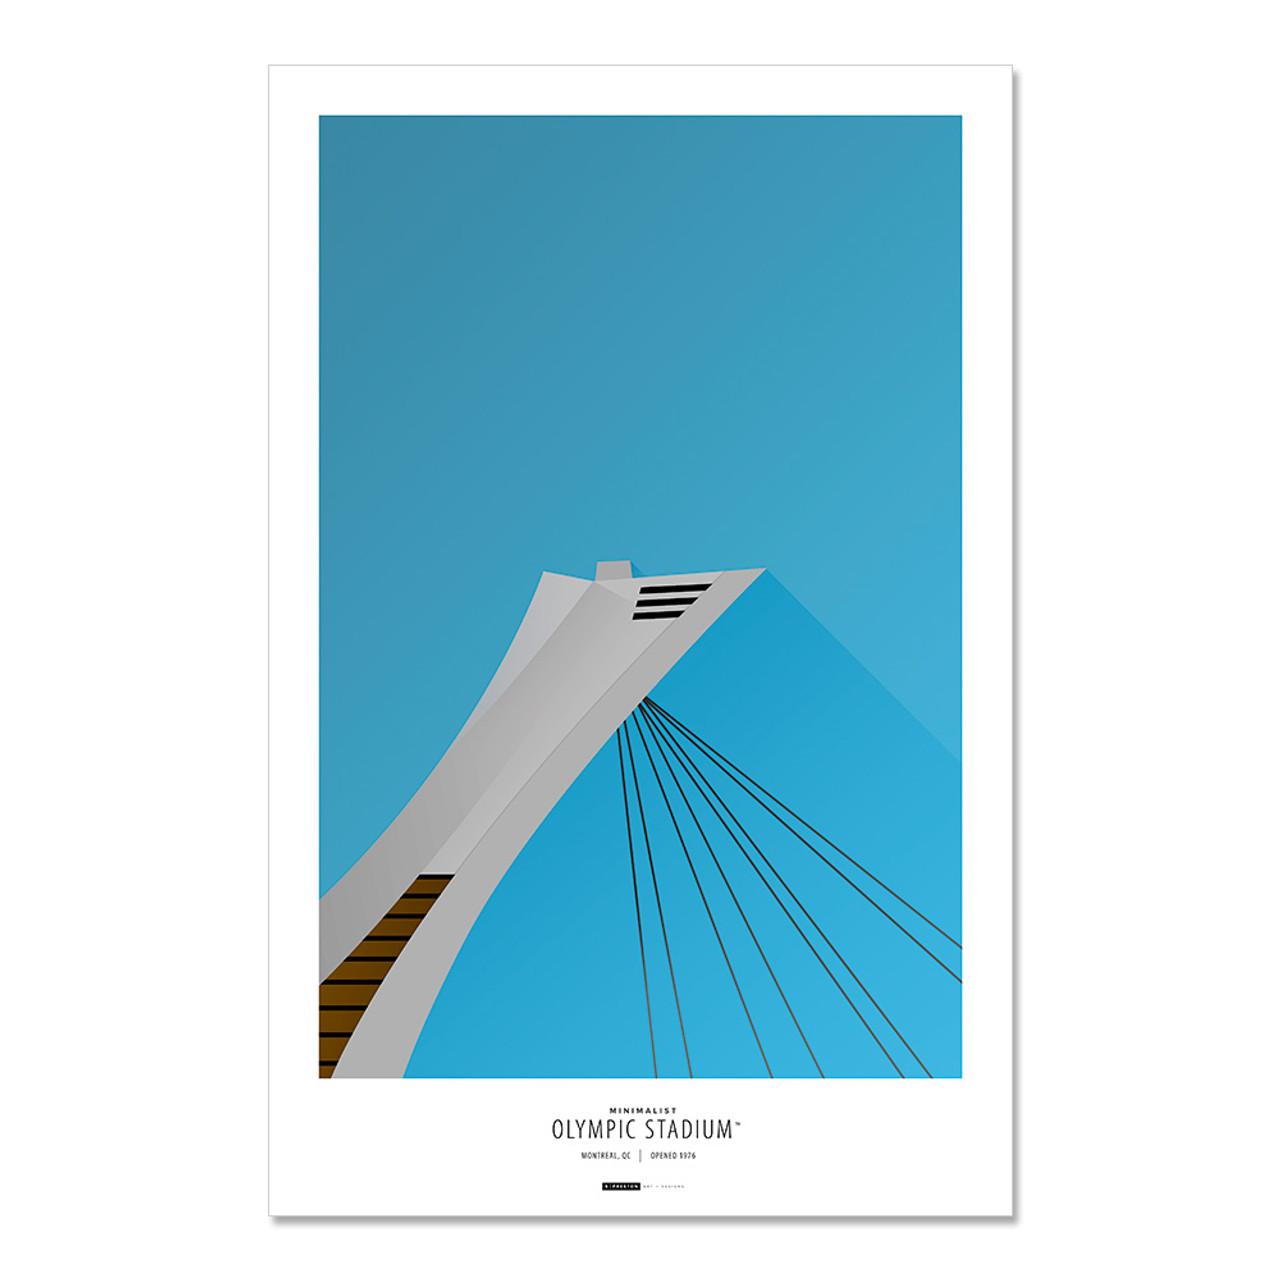 Montreal Expos - Olympic Stadium Art Poster